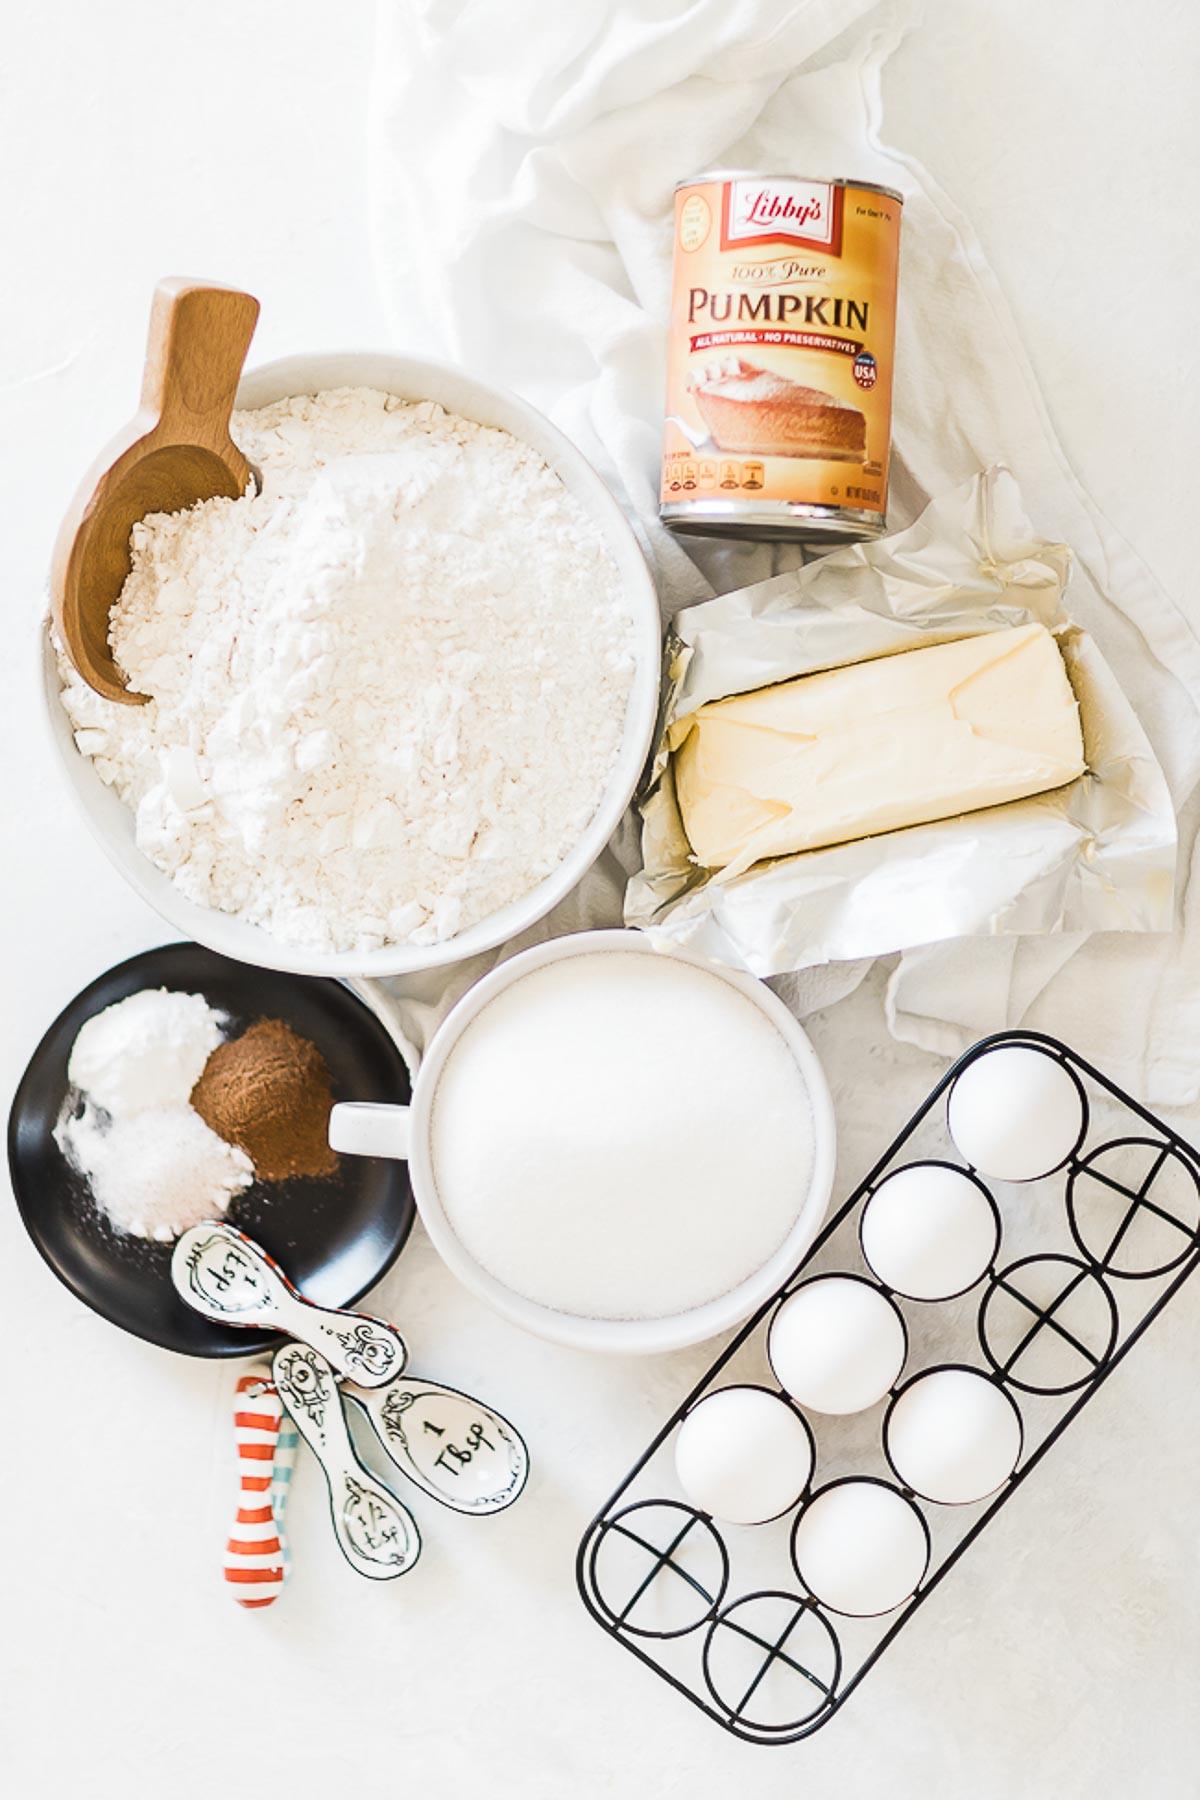 Flour, pumpkin, shortening, eggs, sugar and spices on a white counter.